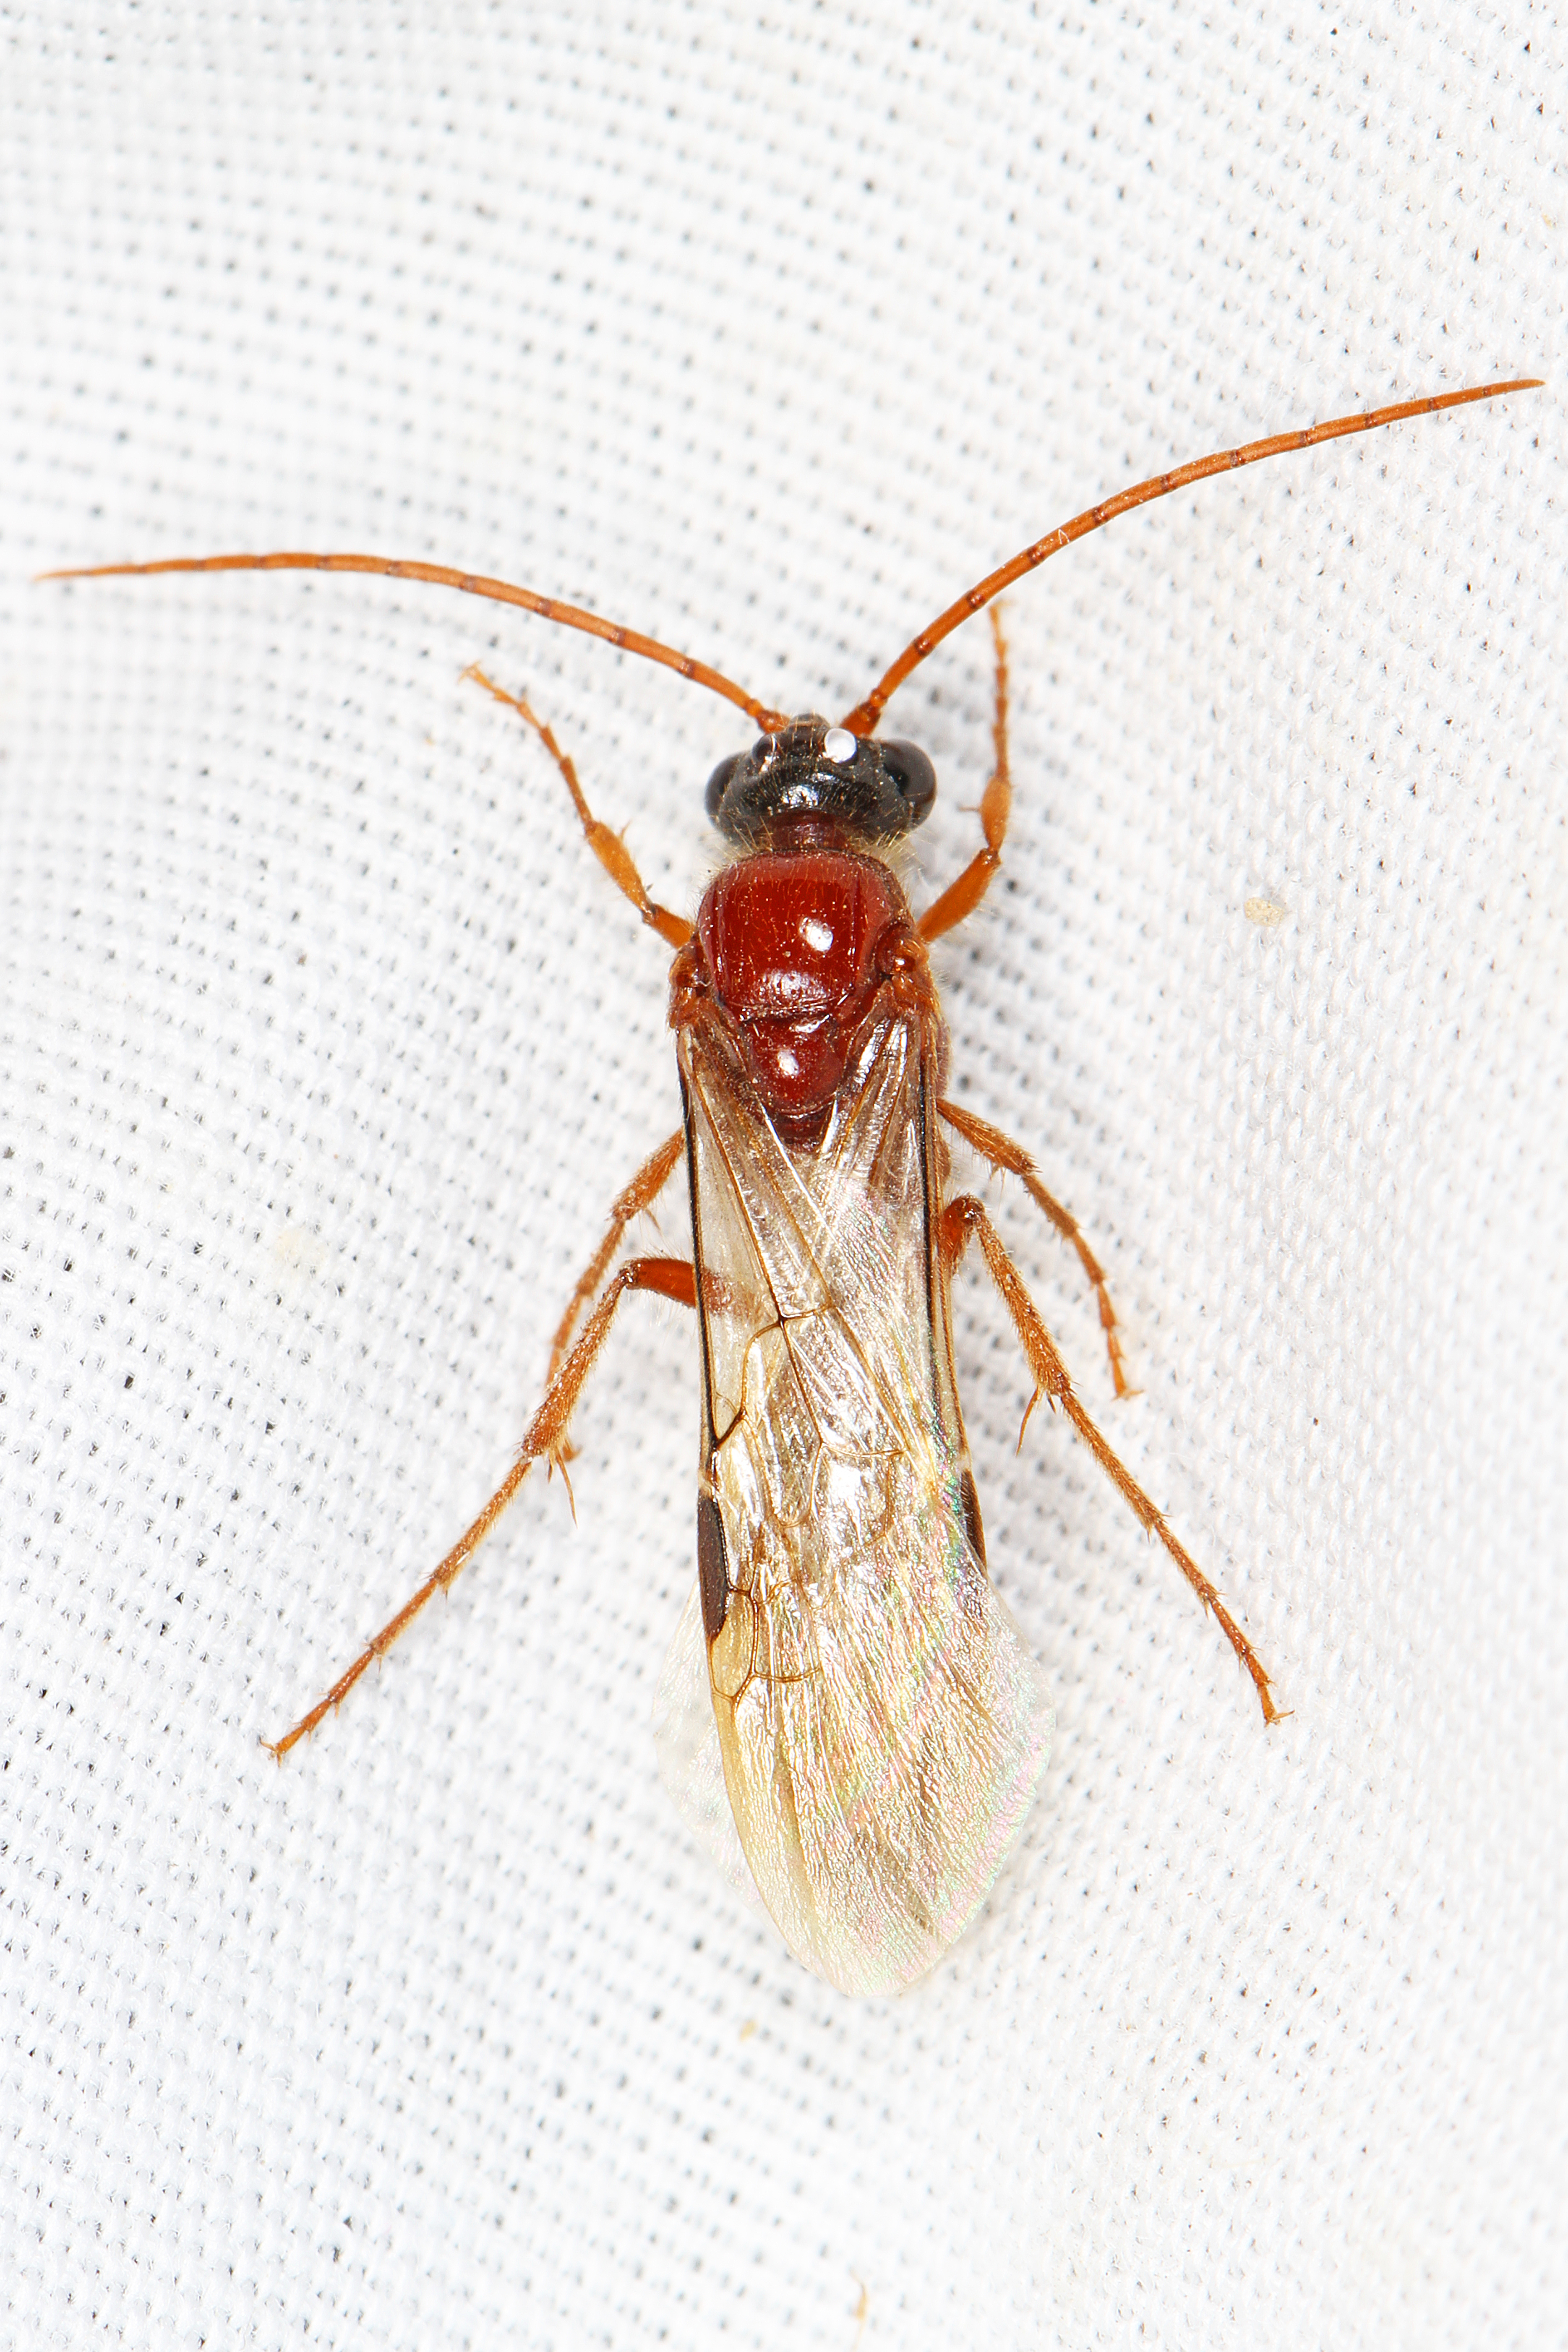 Image of Brachycistidinae